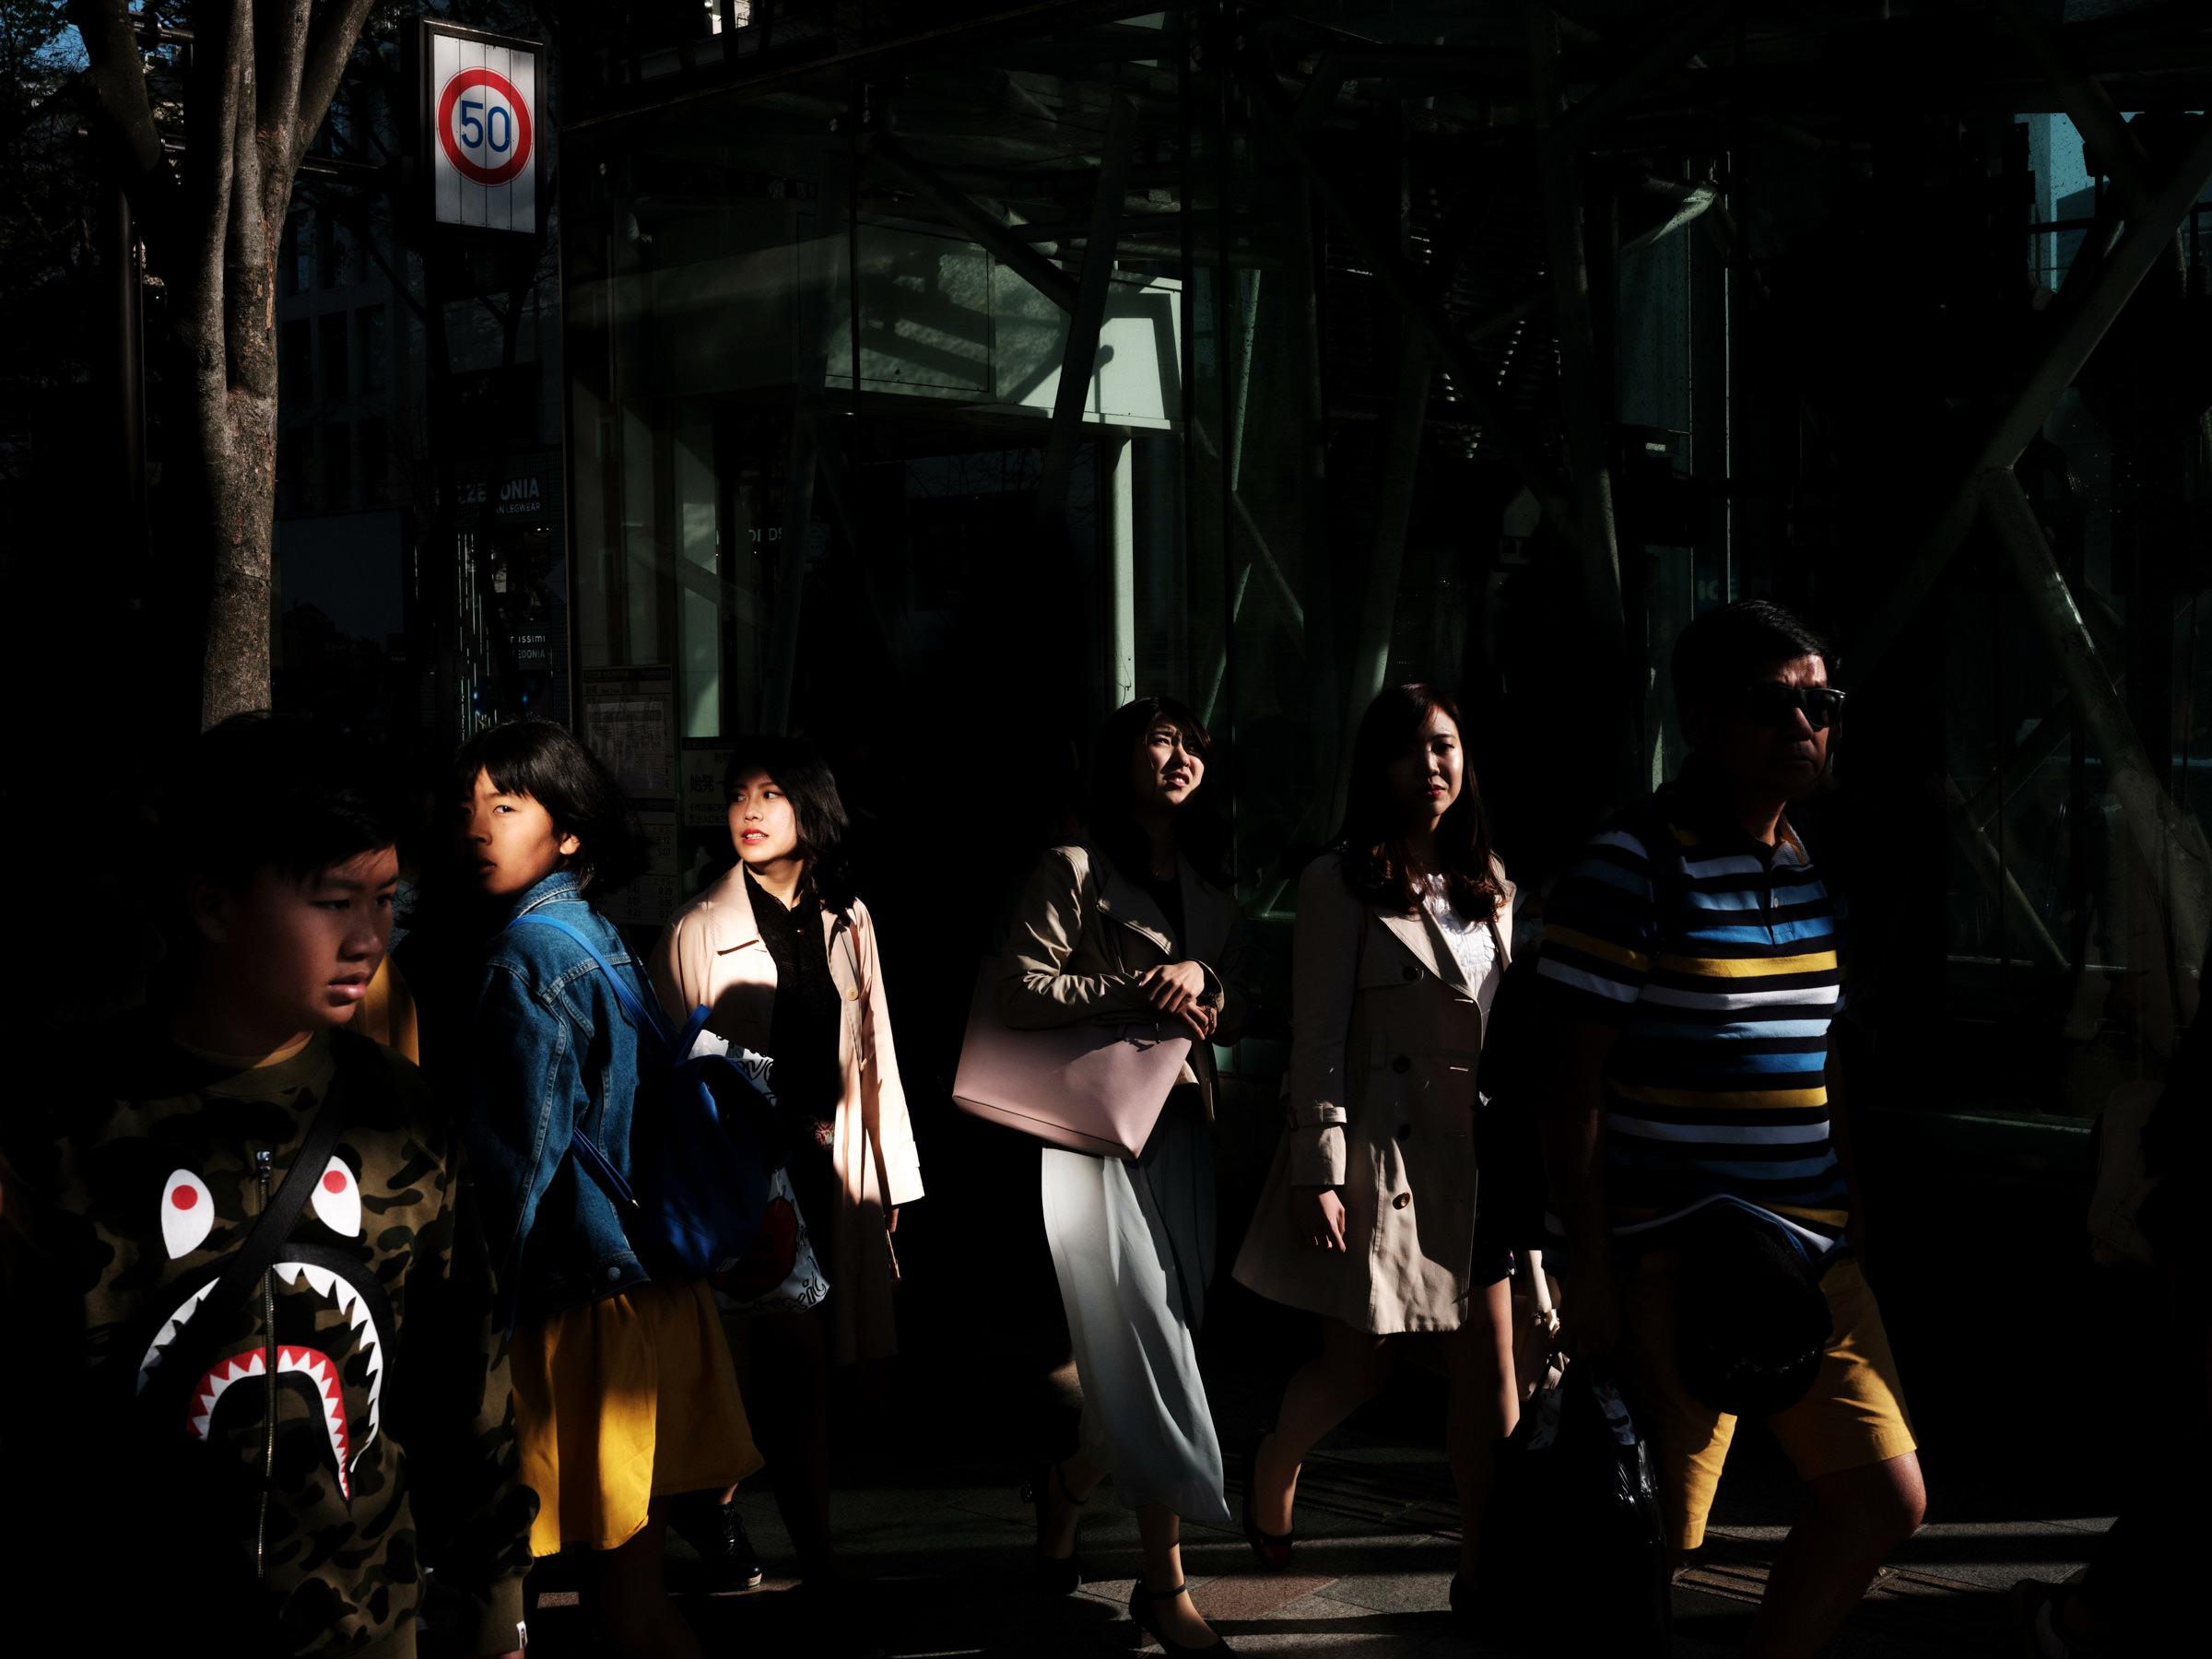 Fujifilm-GFX-Japan-Street-Photography-13